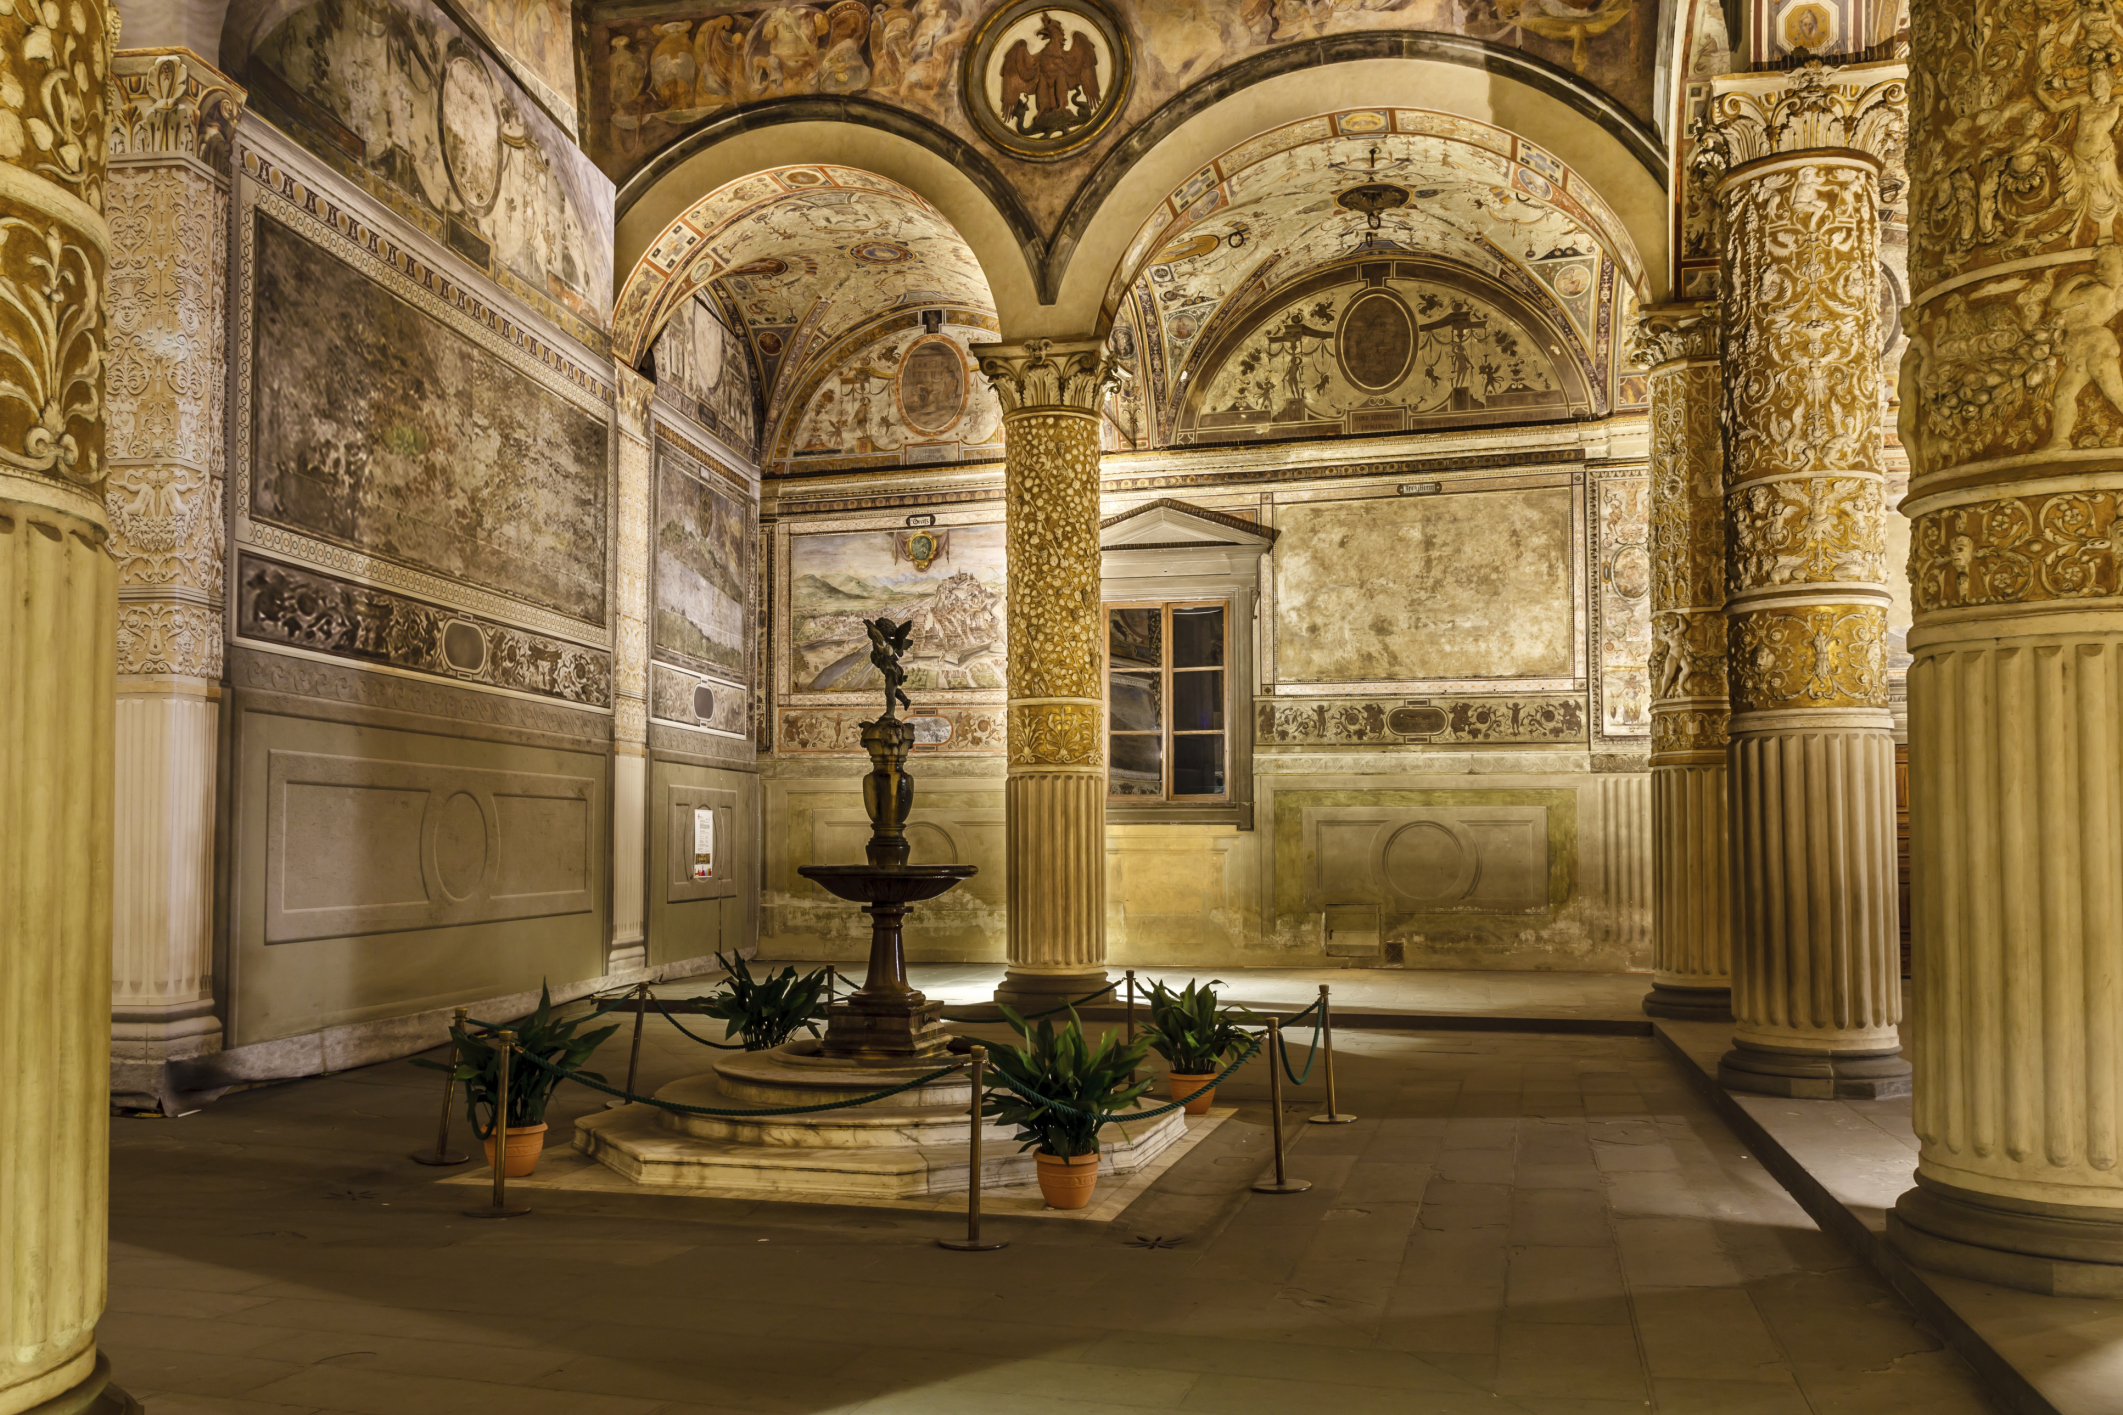 Palazzo Vecchio, Florença, Itália